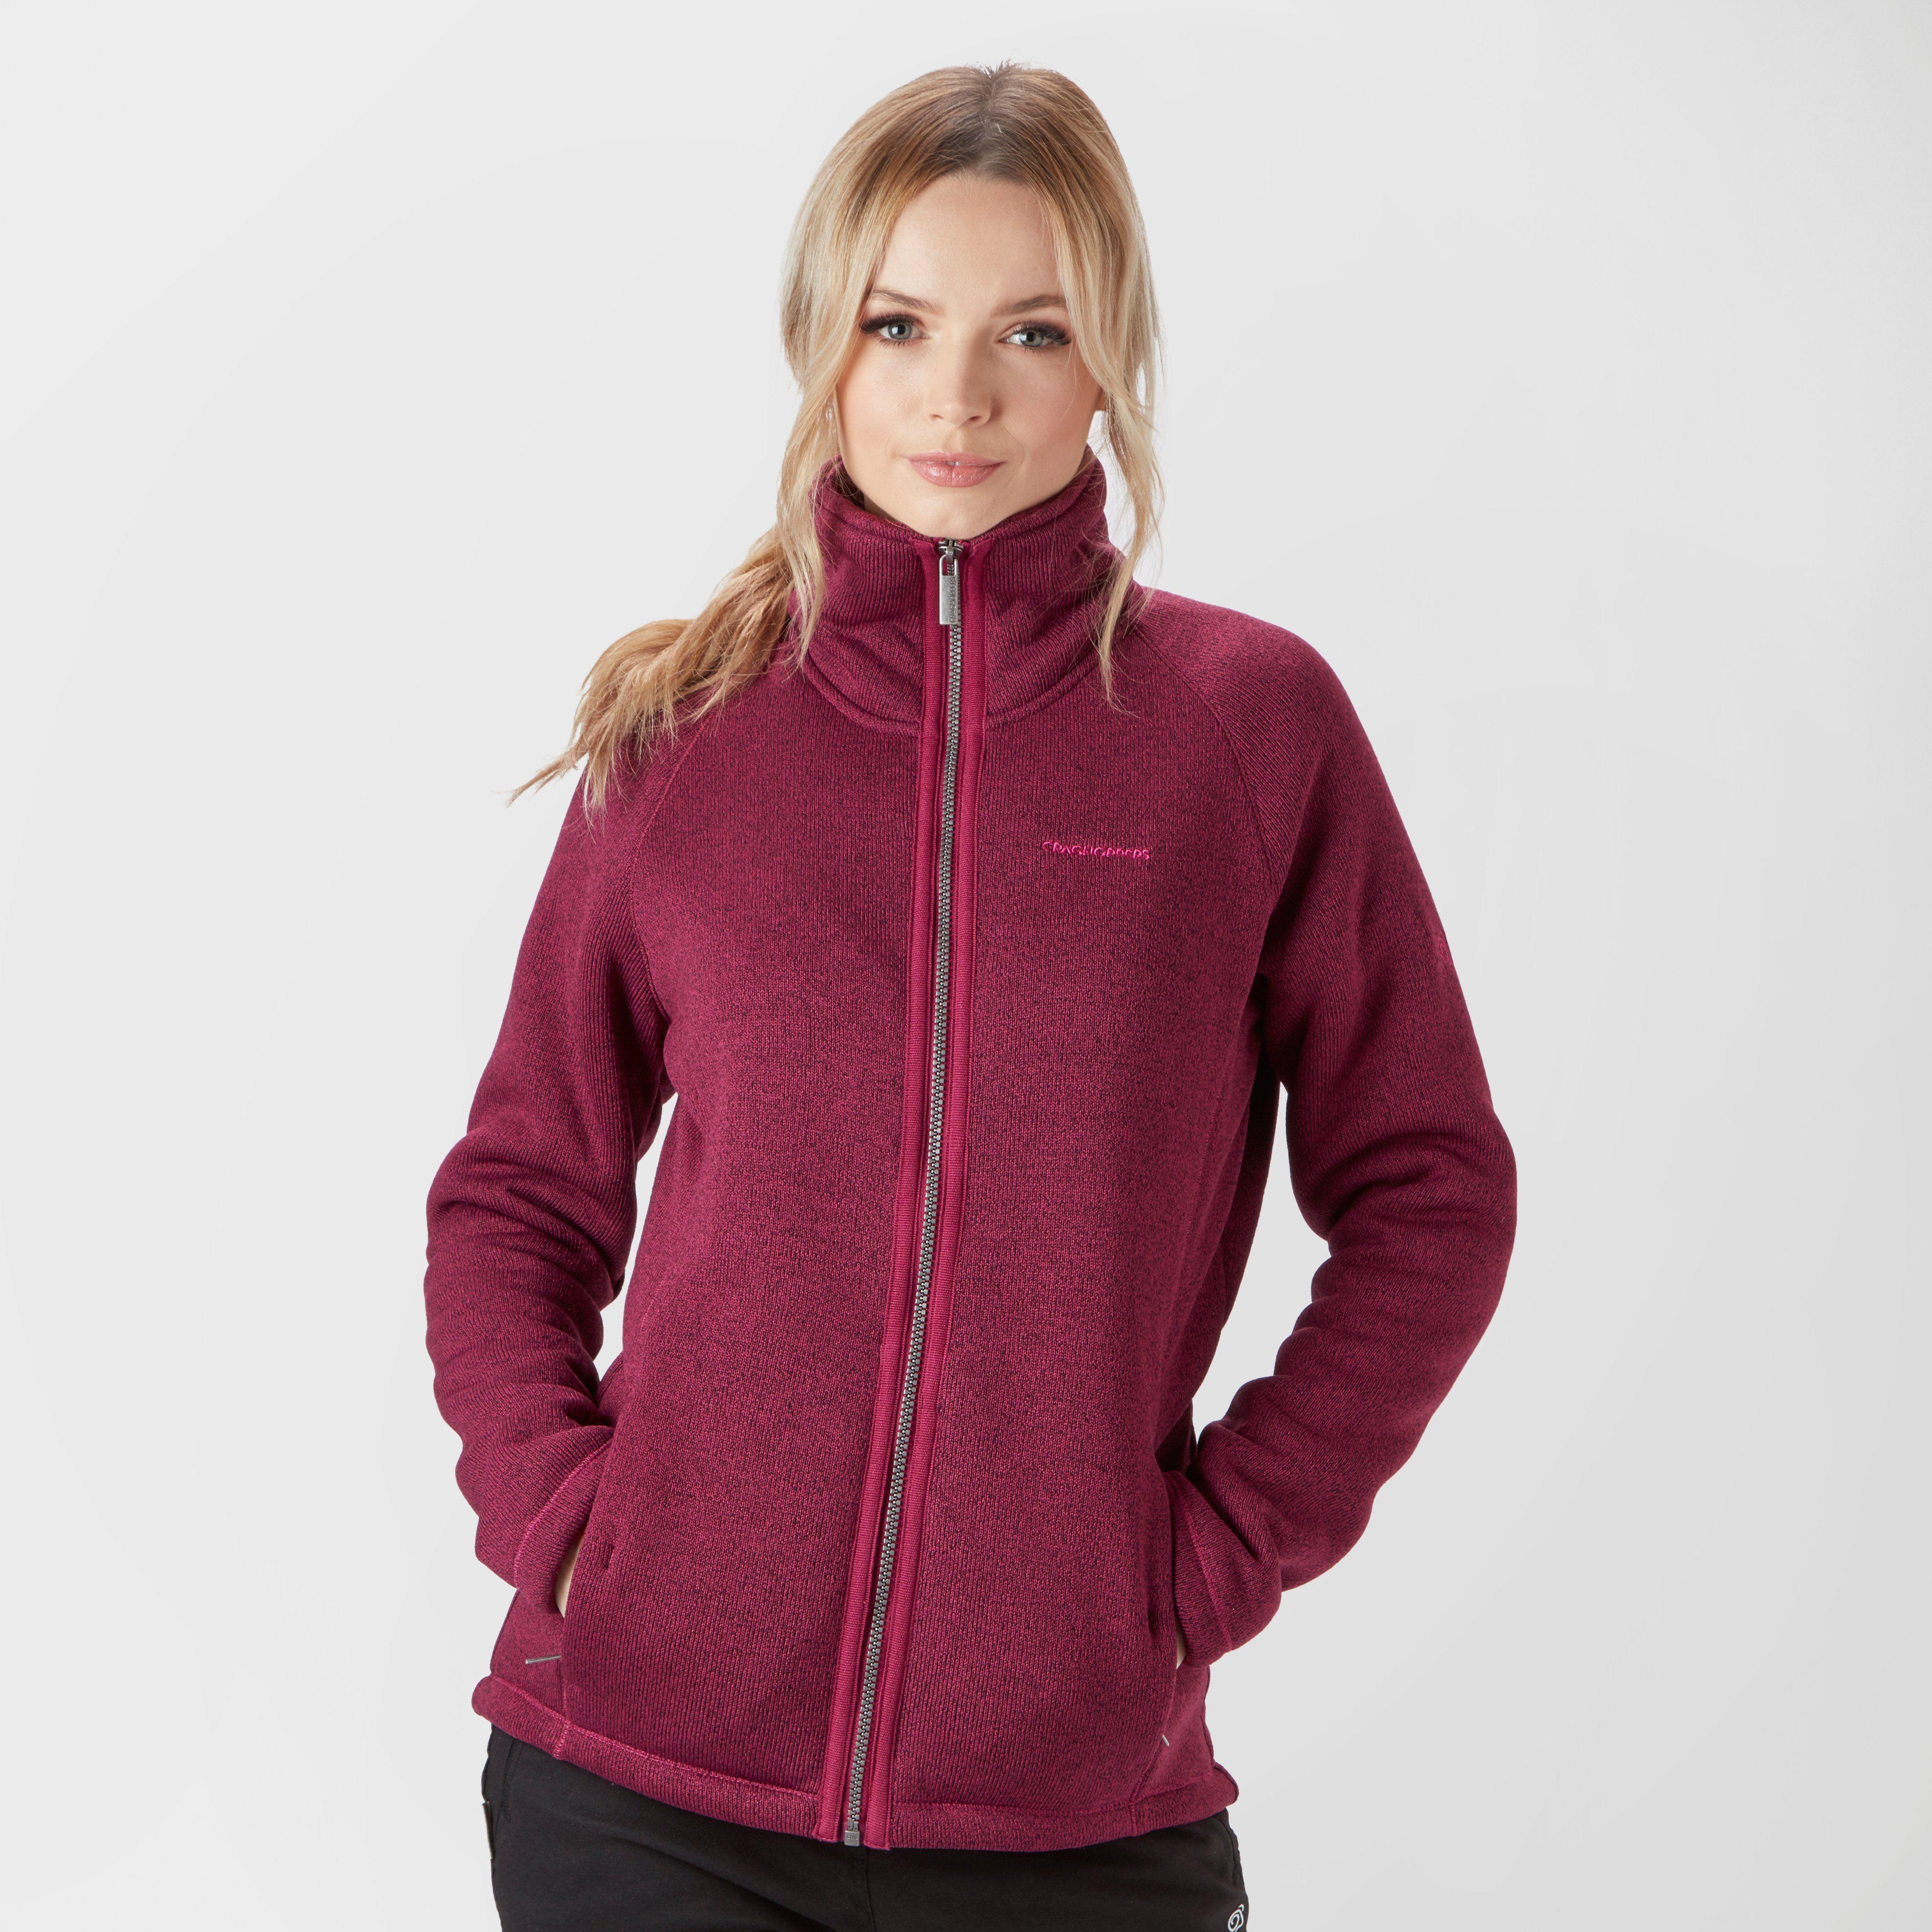 CRAGHOPPERS Women's Mary Borg Full-Zip Fleece